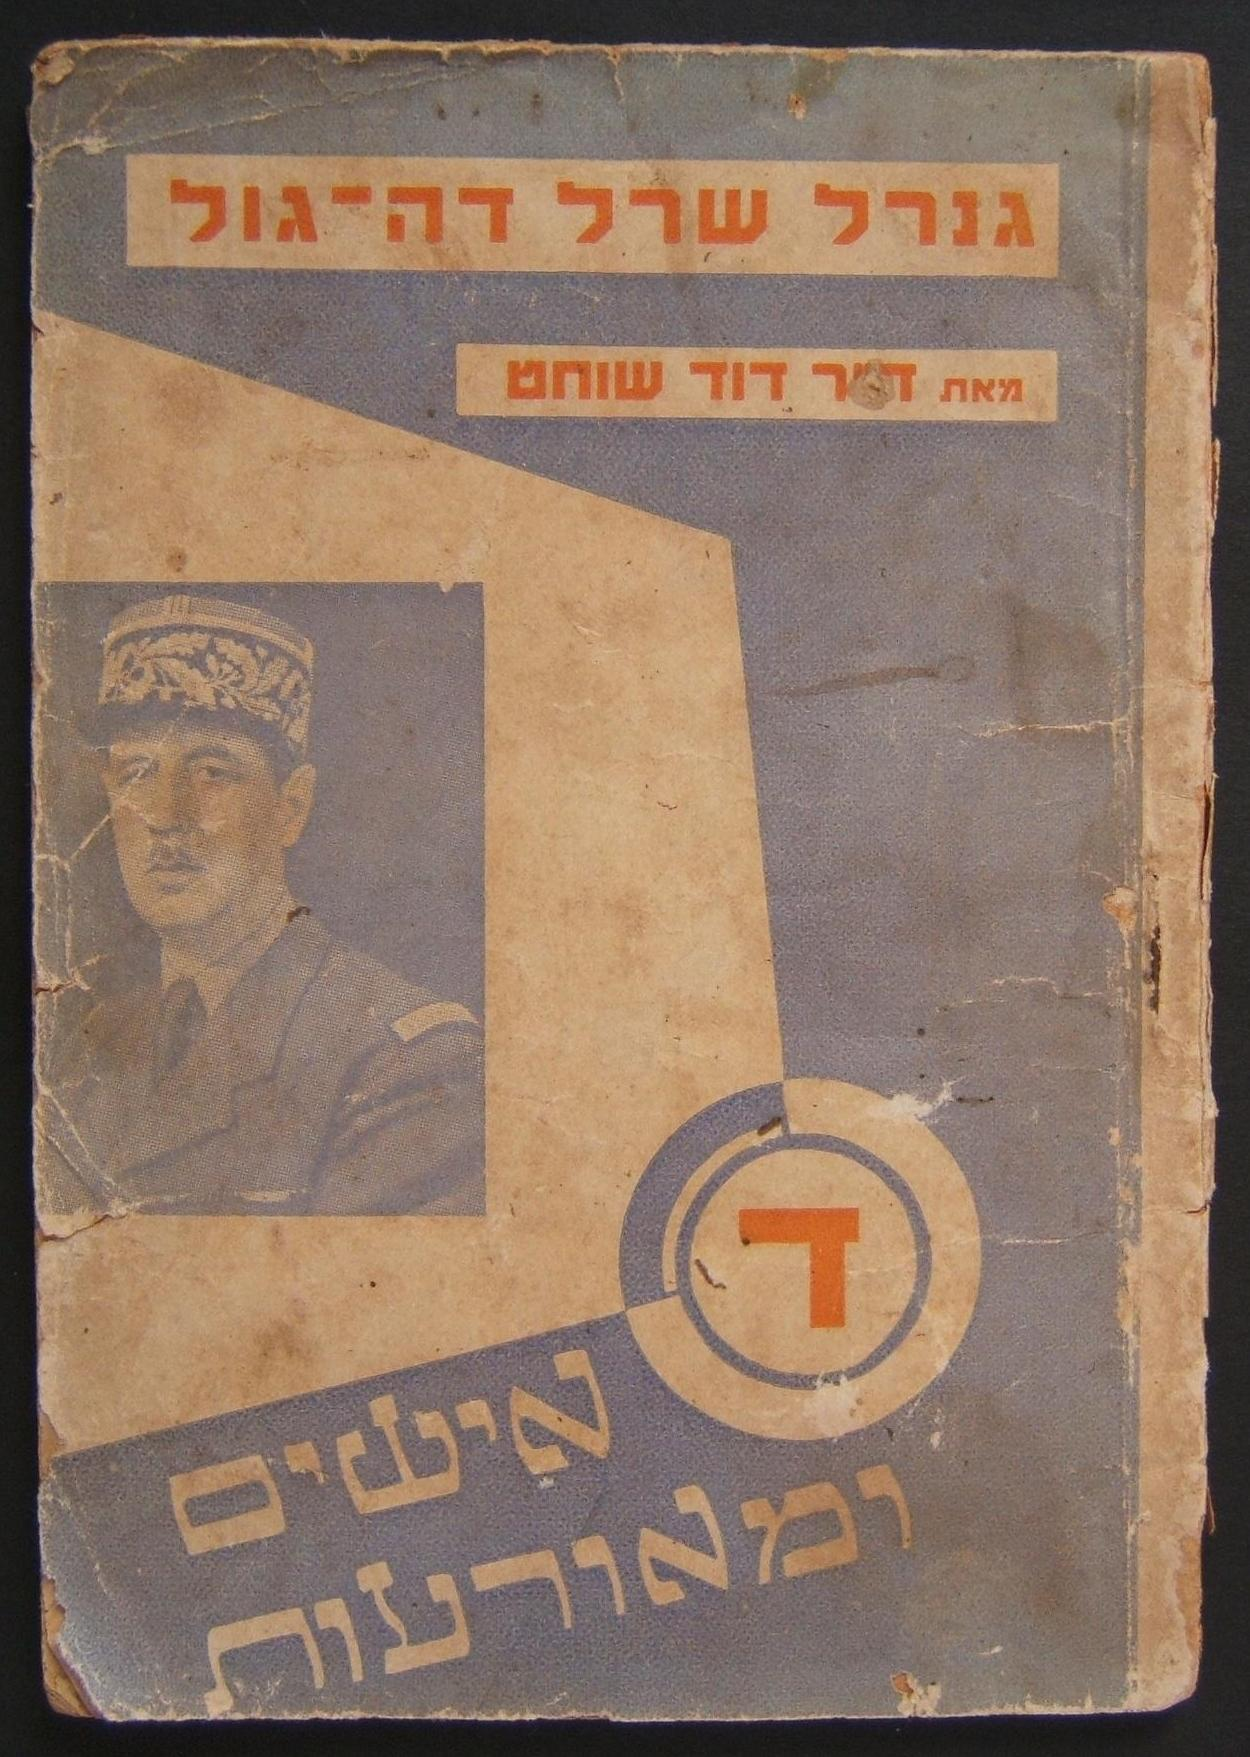 WWII Eretz Israeli Hebrew Charles de Gaulle publicity booklet by D Shochat 1941